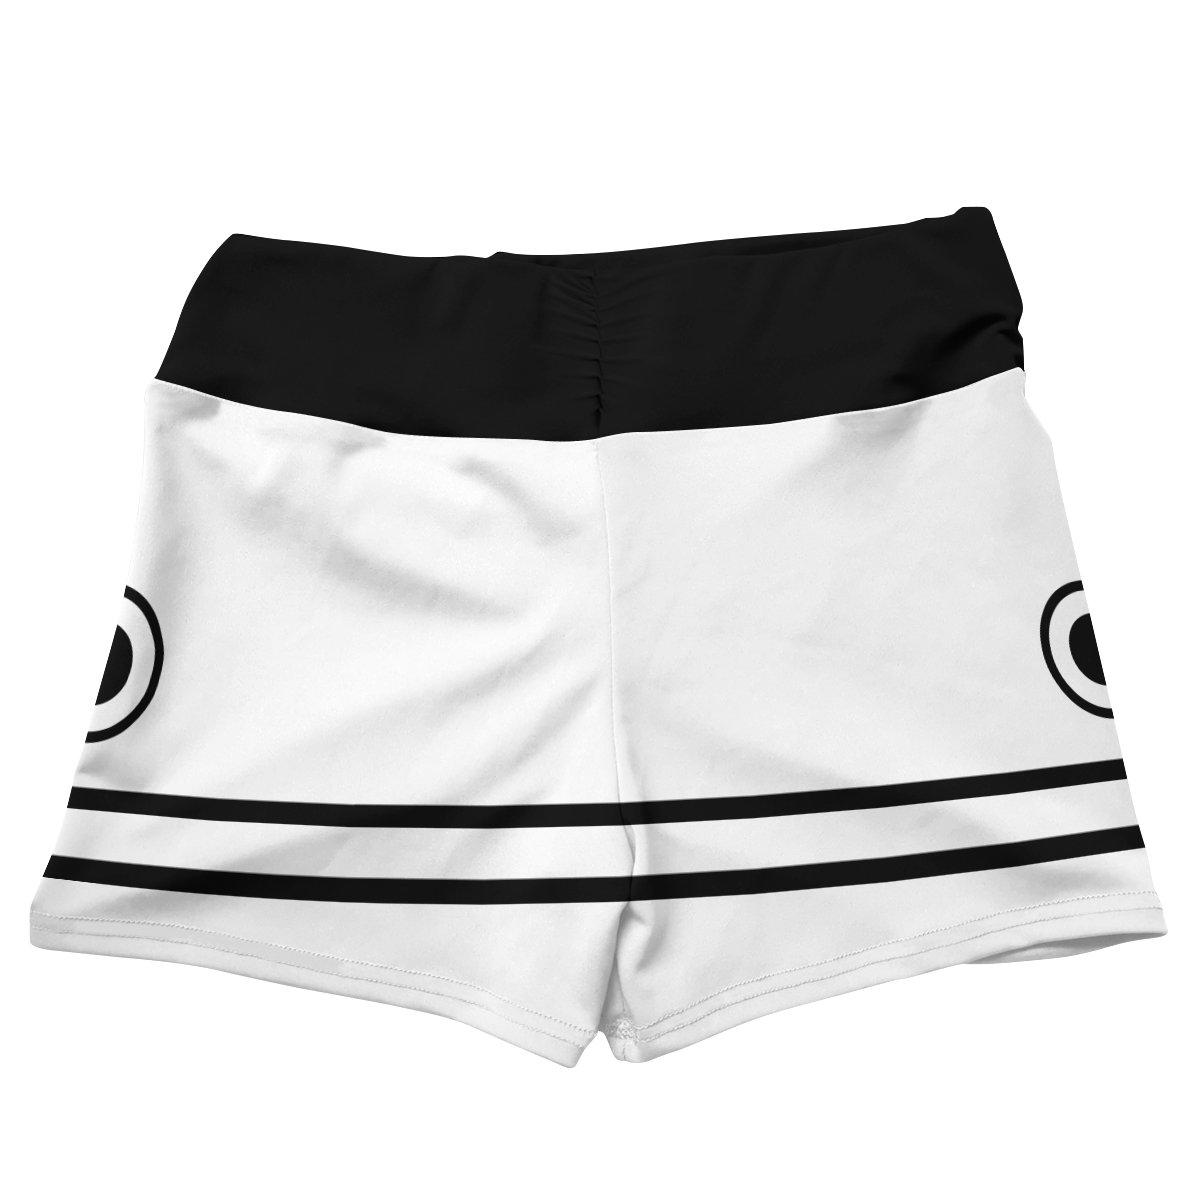 sukuna active wear set 218270 - Anime Swimsuits